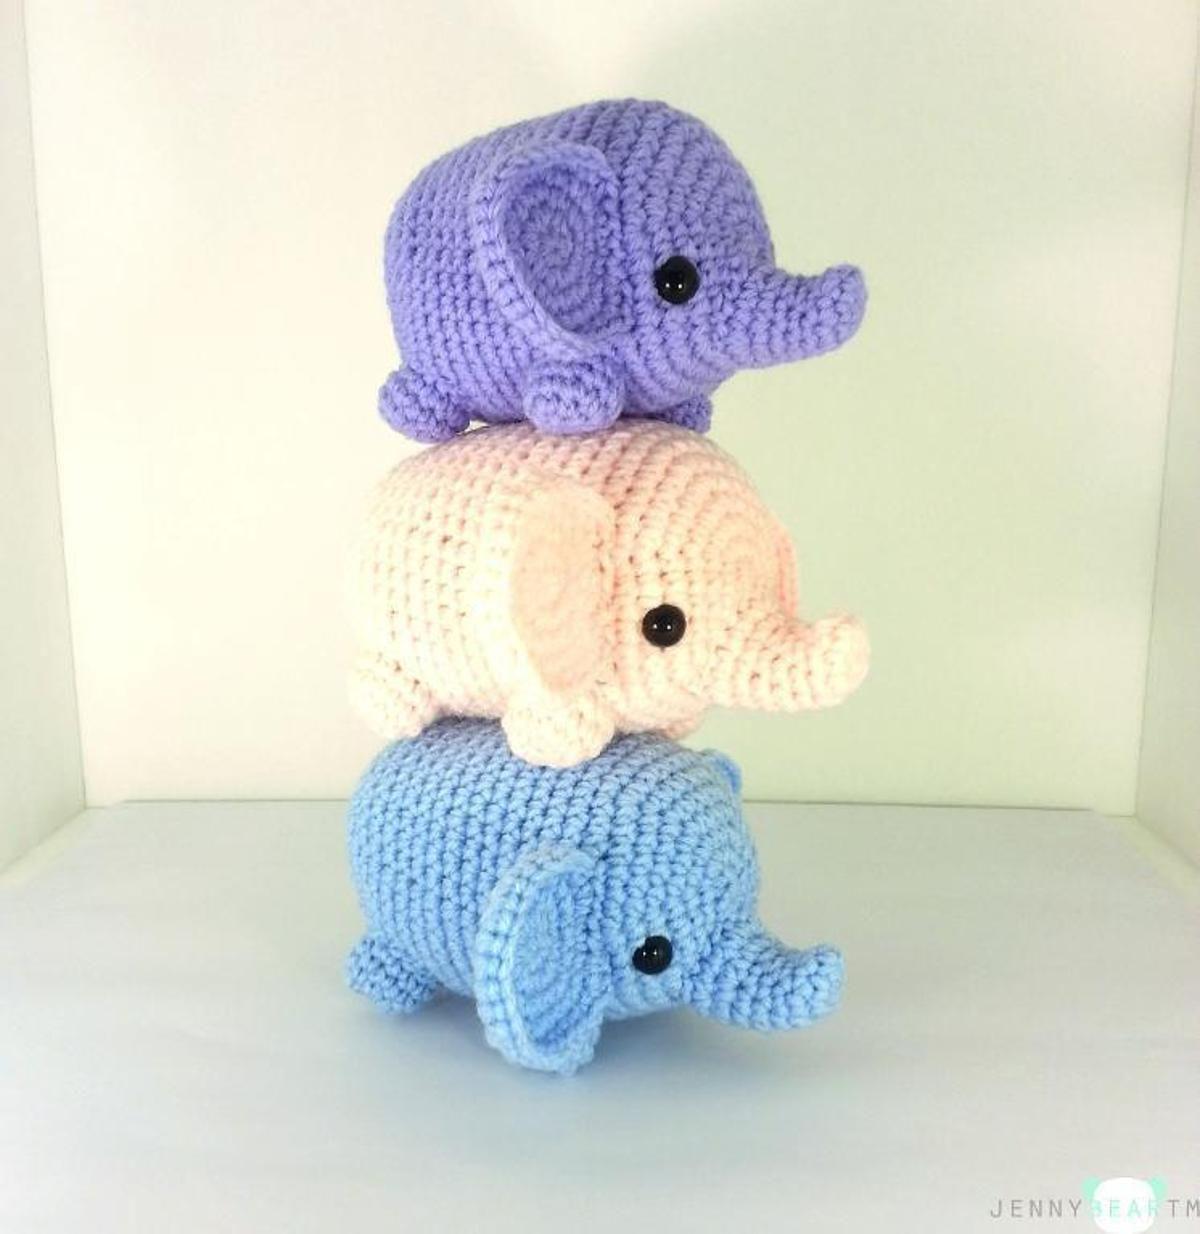 Midi elephant amigurumi plush amigurumi and plush midi elephant amigurumi plush bankloansurffo Images